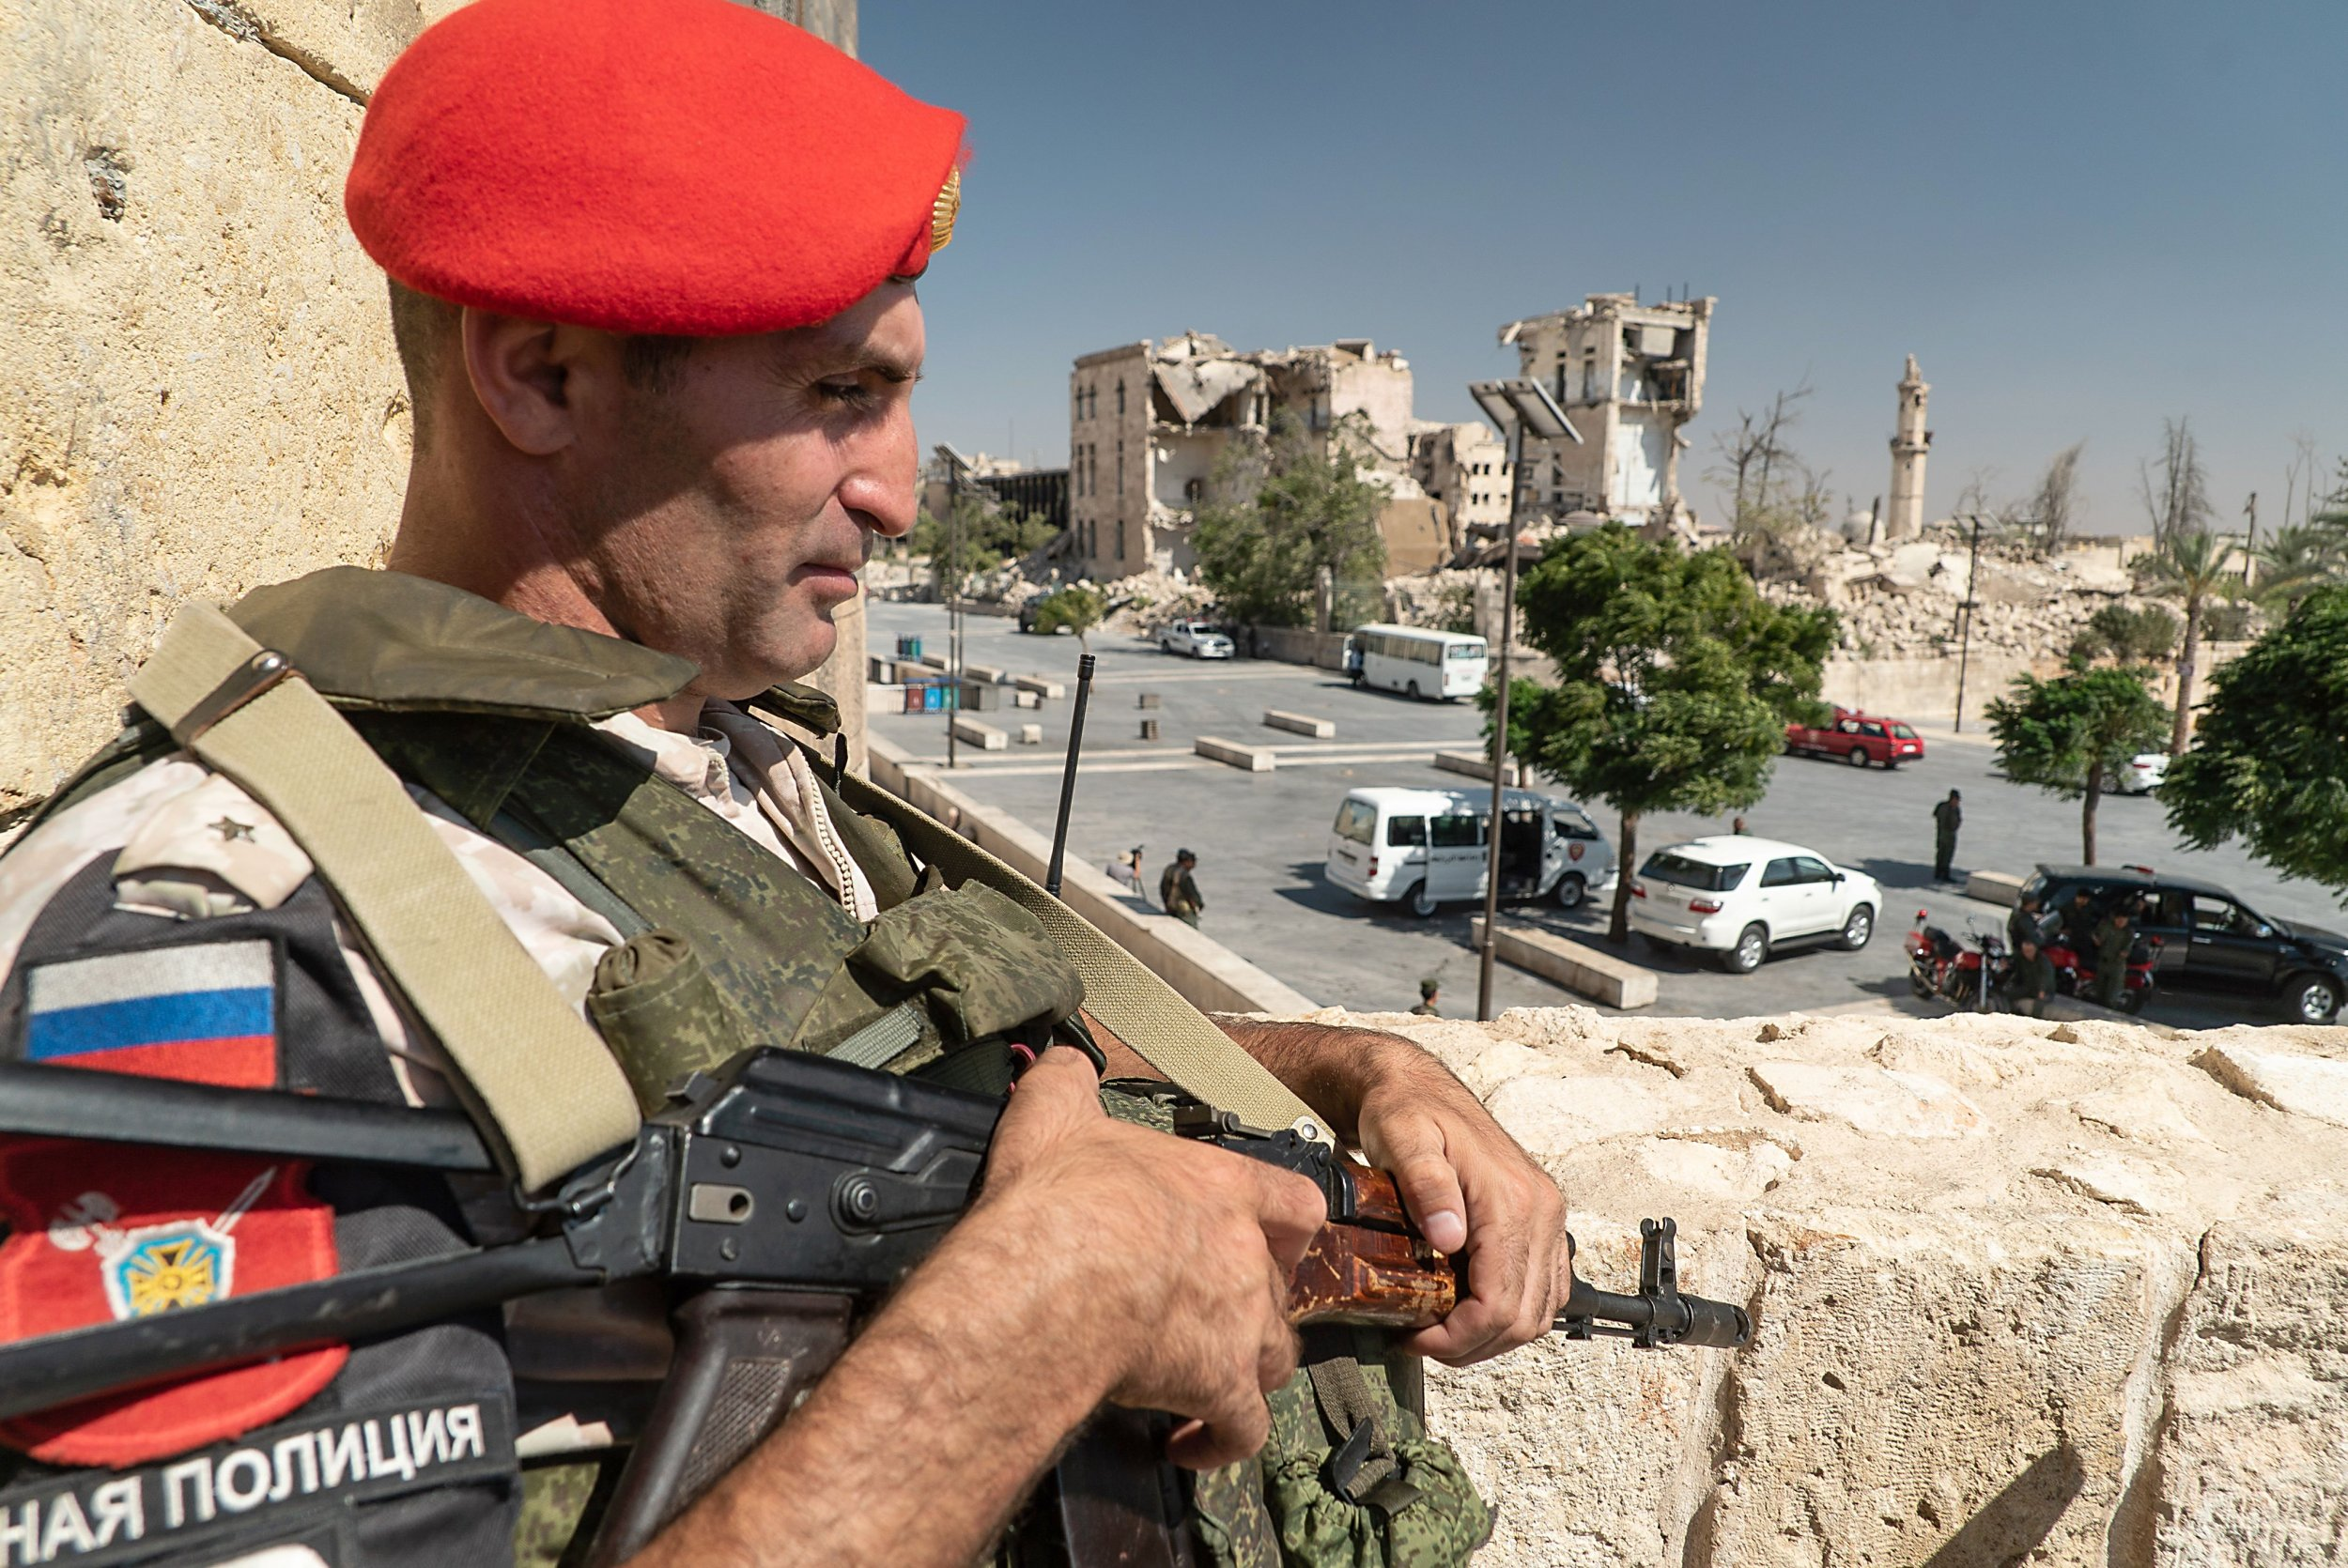 Russian soldier Syria social media